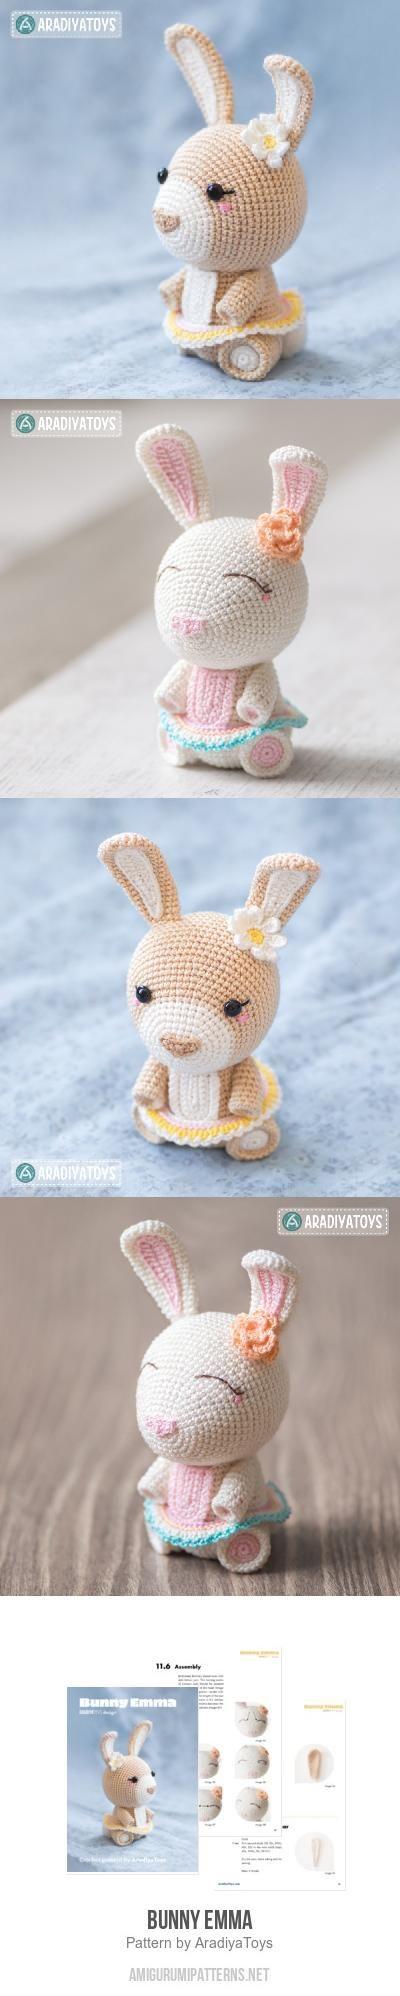 Bunny Emma Amigurumi Pattern